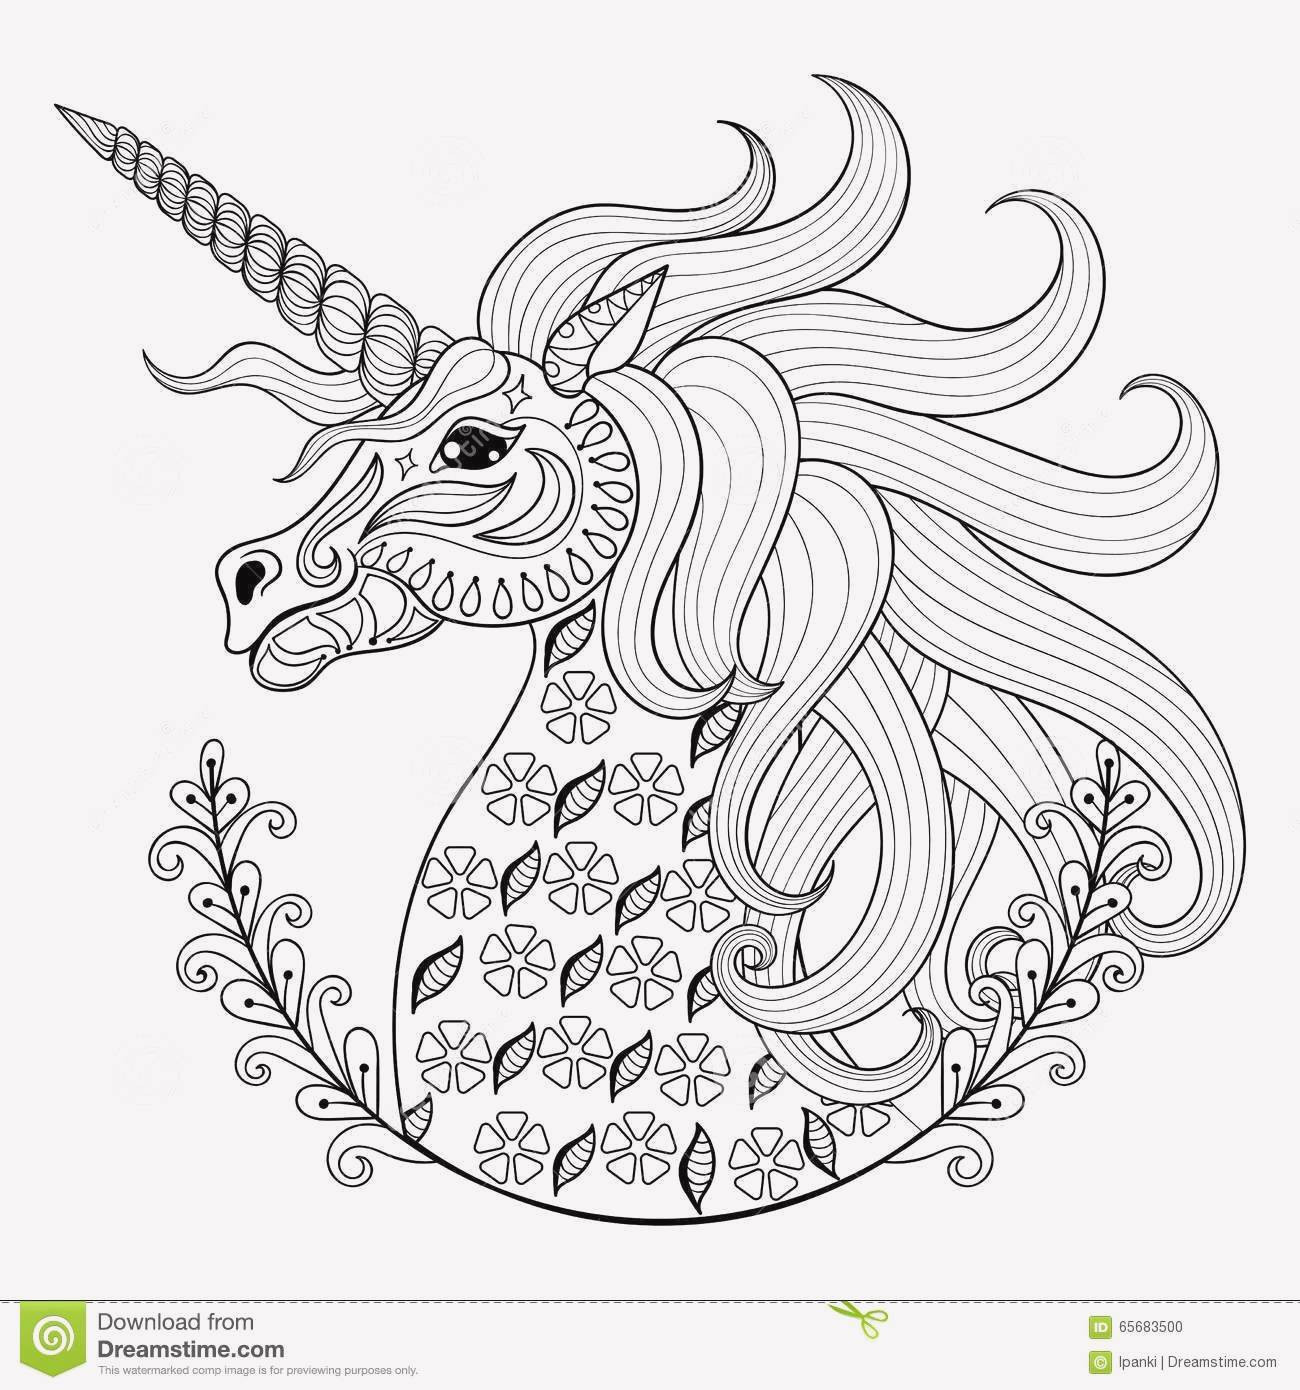 Pegasus Zum Ausmalen Neu 25 Fantastisch Malvorlage Pegasus Pferd 2 Das Bild